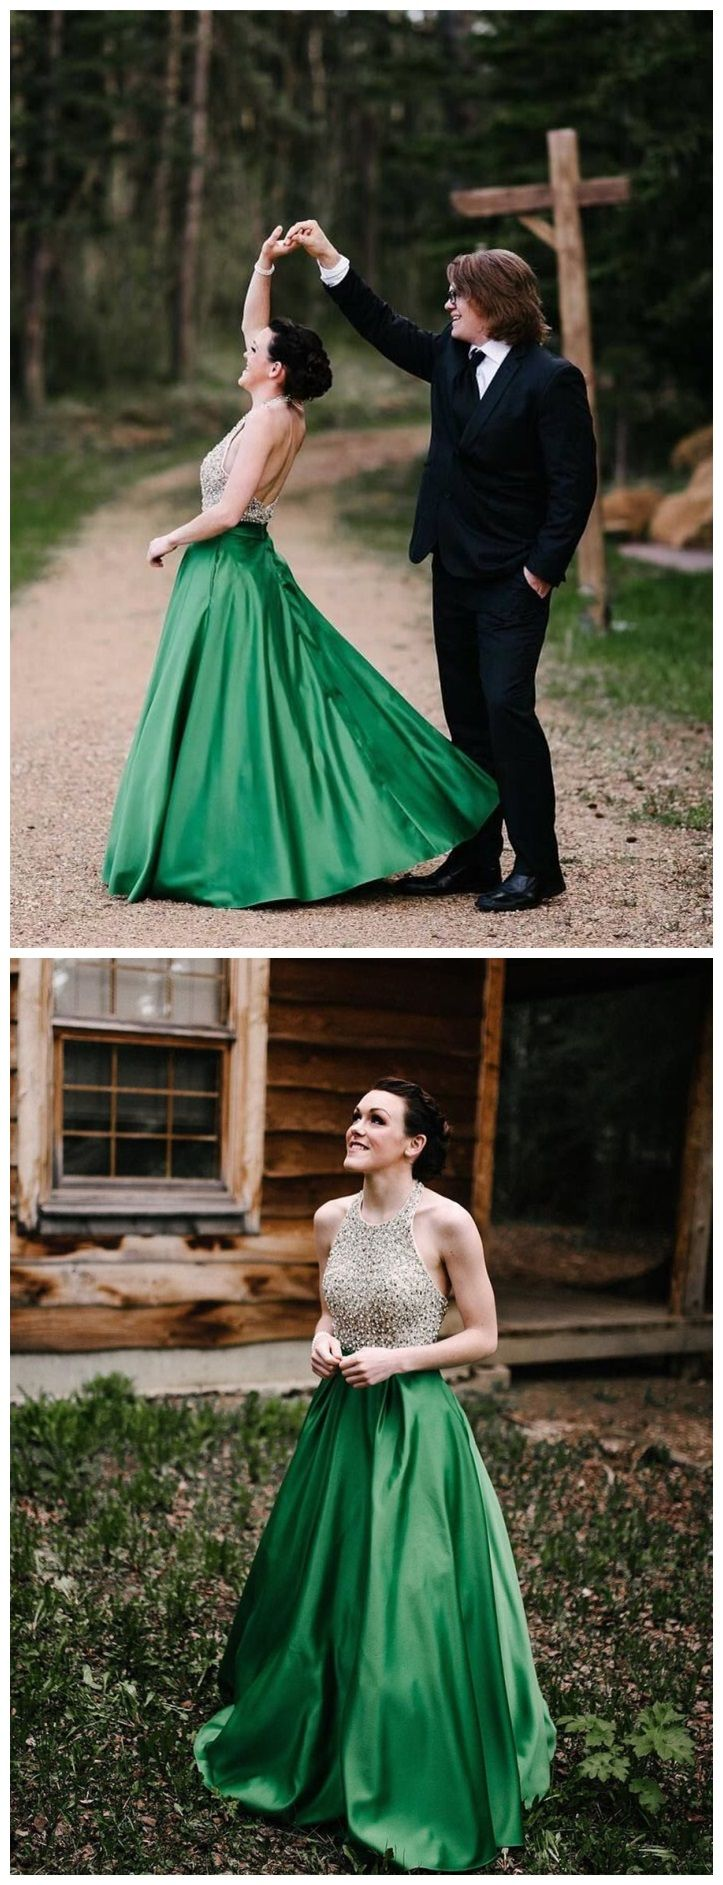 Halter emerald green beaded prom dresses backless satin long prom